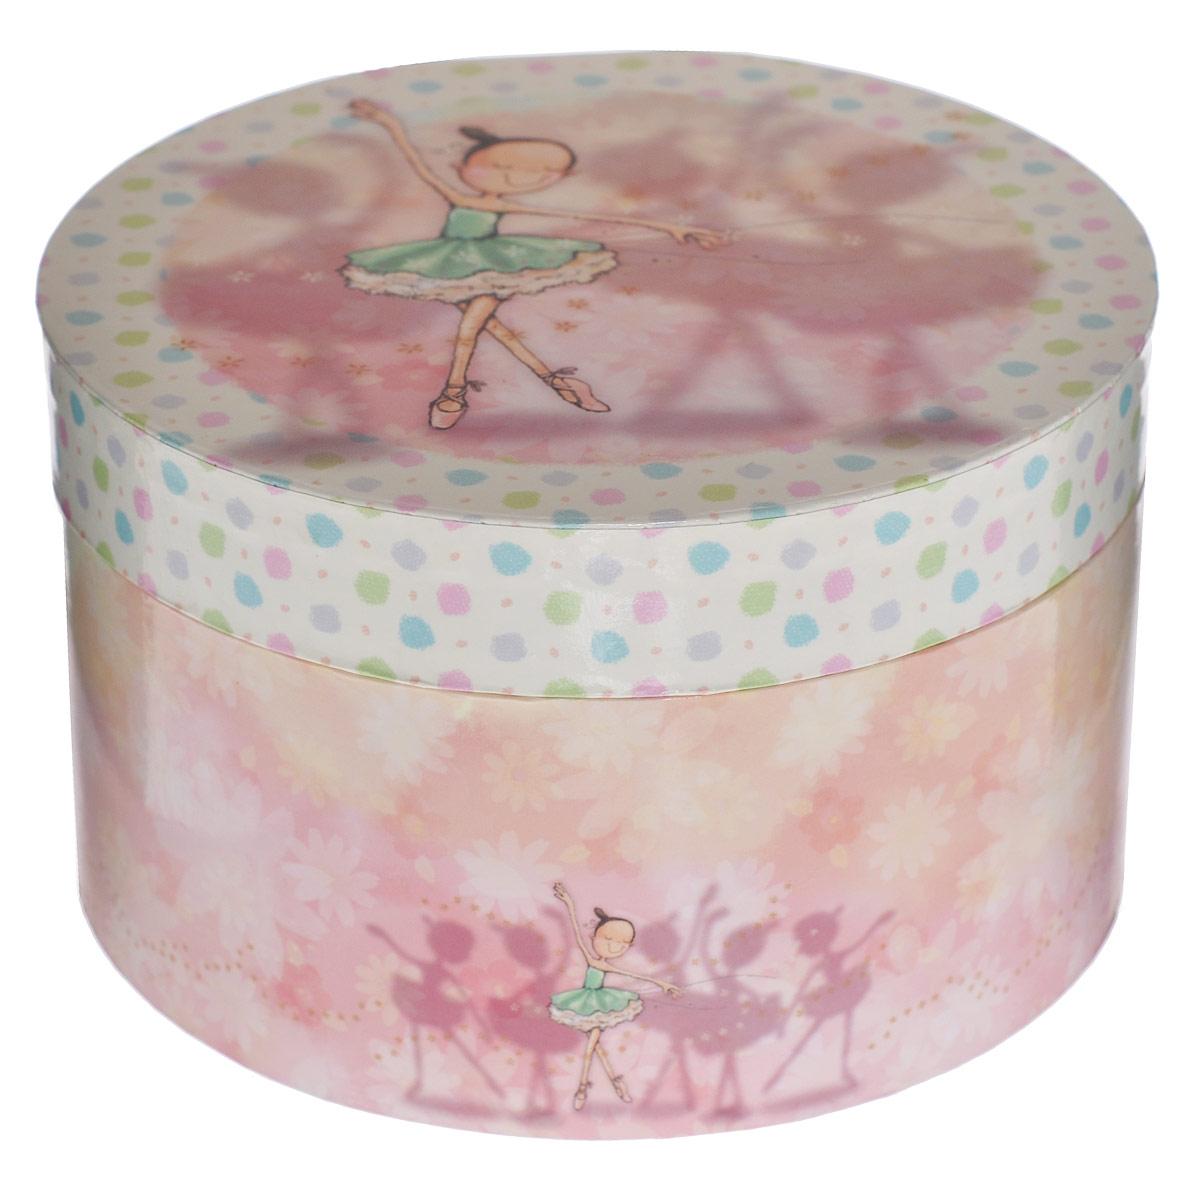 Музыкальная шкатулка Jakos  Балерина , цвет: бежевый, розовый -  Детская комната